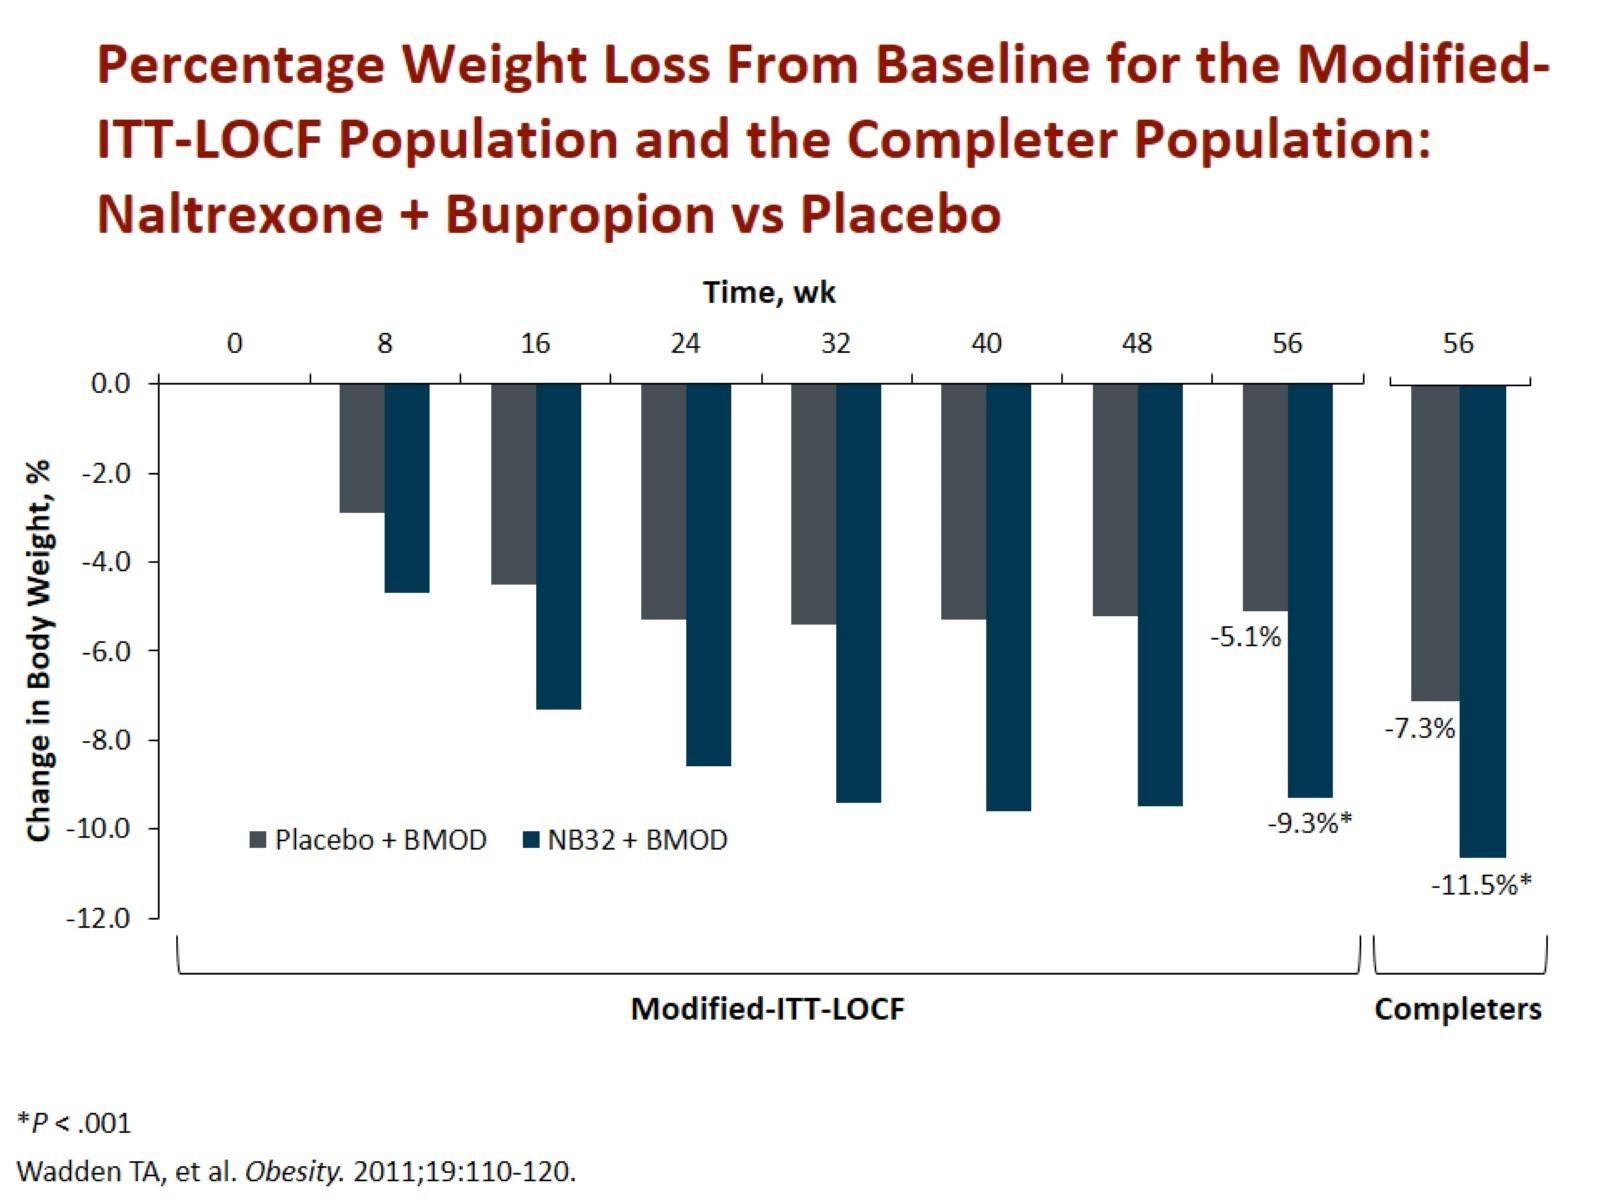 Redukce hmotnosti po 1 roce léčby naltrexonem + bupropionem oproti placebu. Zdroj: Wadden TA, Foreyt JP, Foster GD et al. Weight loss with naltrexone SR/bupropion SR combination therapy as an adjunct to behavior modification: the COR-BMOD trial. Obesity (Silver Spring) 2011; 19(1): 110–120. doi: 10.1038/oby.2010.147.<br> Fig. 4. Wadden TA, Foreyt JP, Foster GD et al. Weight loss with naltrexone SR/bupropion SR combination therapy as an adjunct to behavior modification: the COR-BMOD trial. Obesity (Silver Spring) 2011; 19(1): 110–120. doi: 10.1038/oby.2010.147.